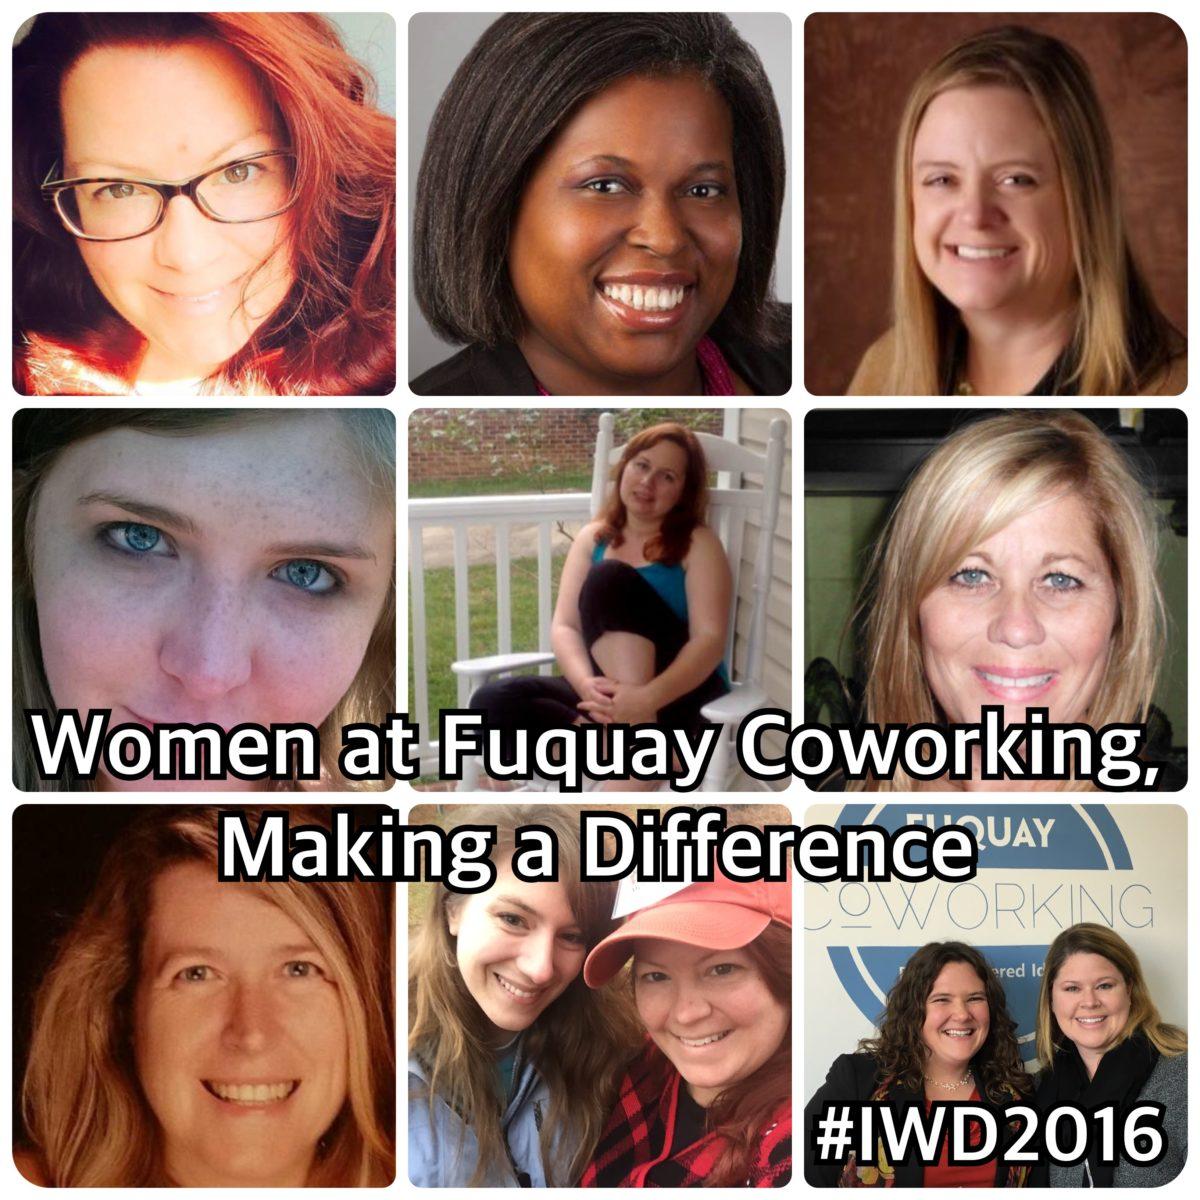 Fuquay Coworking Celebrates International Women's Day 2016